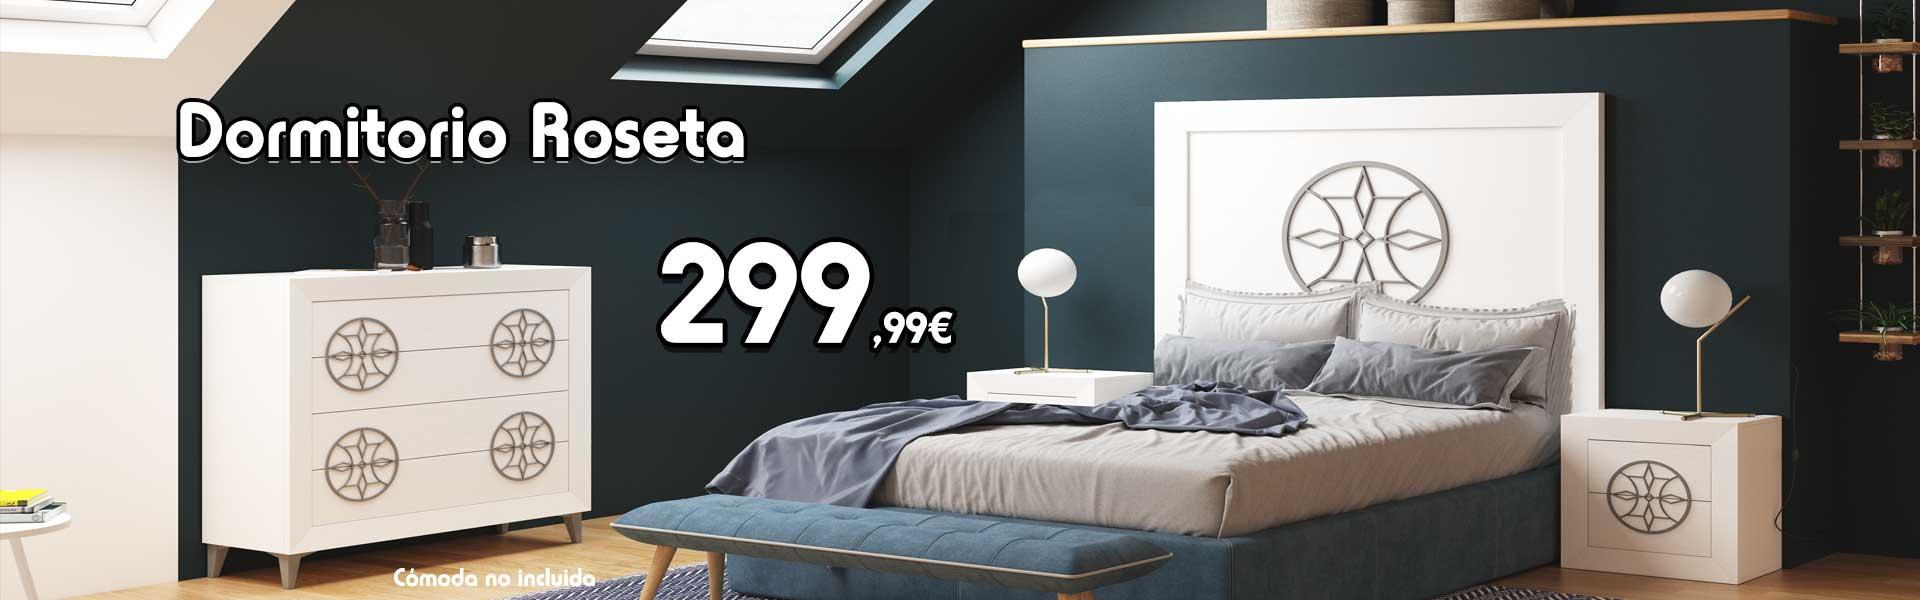 Dormitorio roseta 1920 600